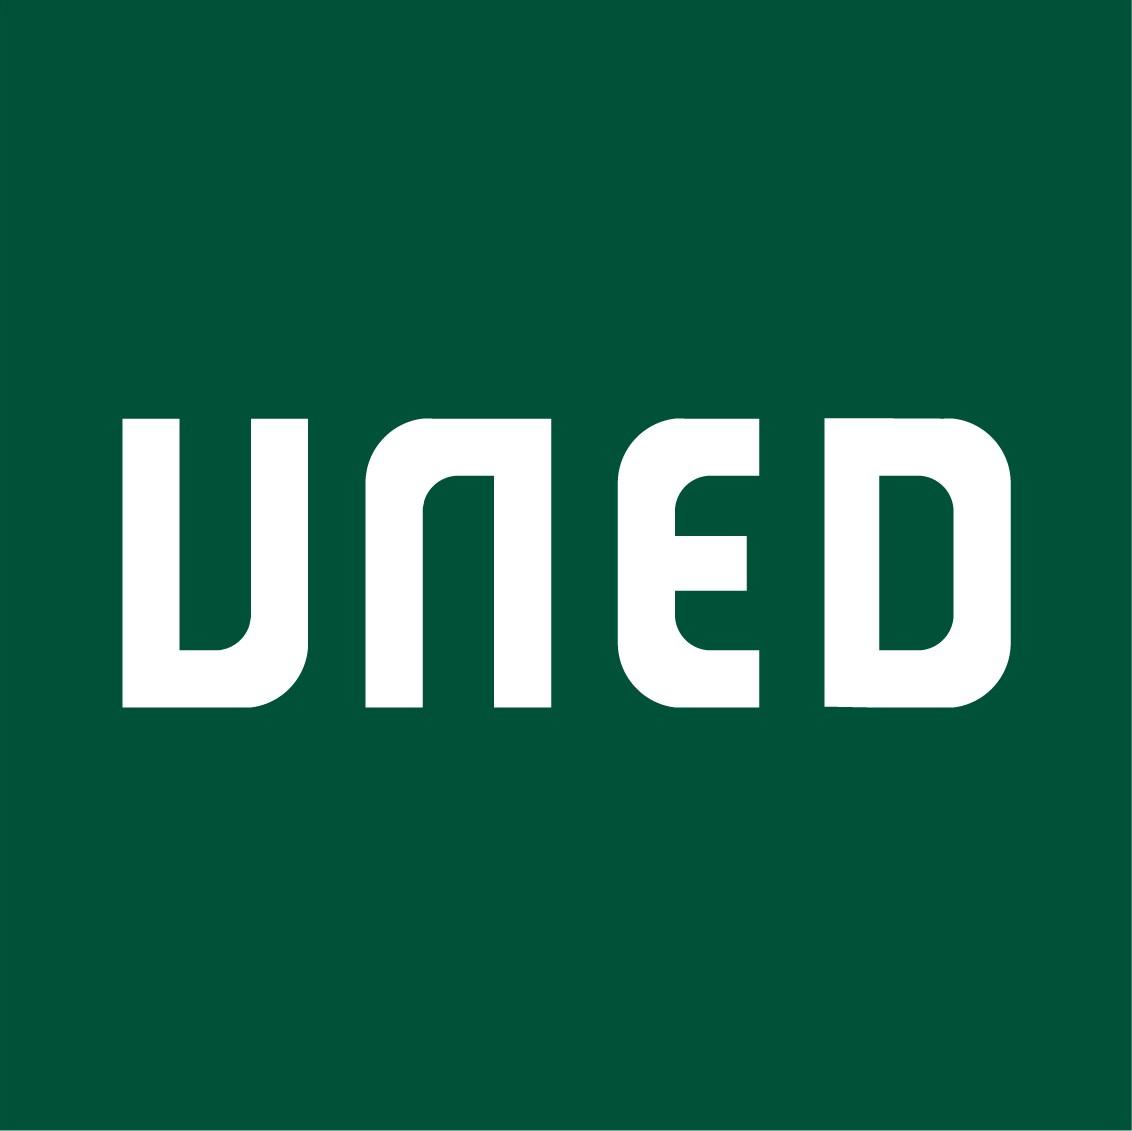 UNED_Logo_National_University_of_Distance_Education